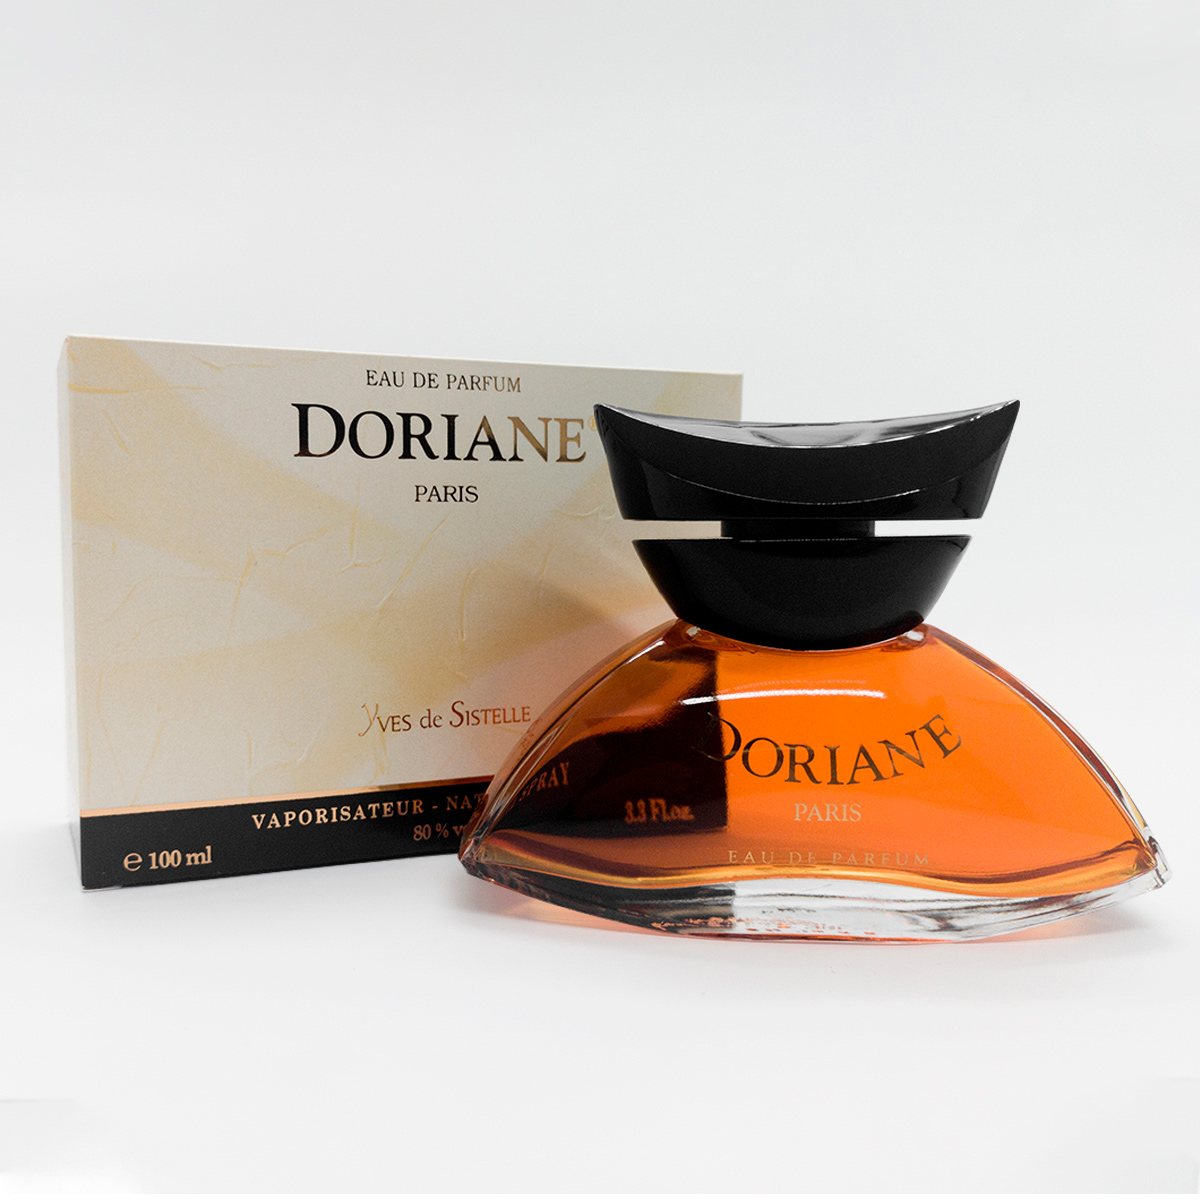 Perfume Doriane Woman Edp 100ml Paris Bleu